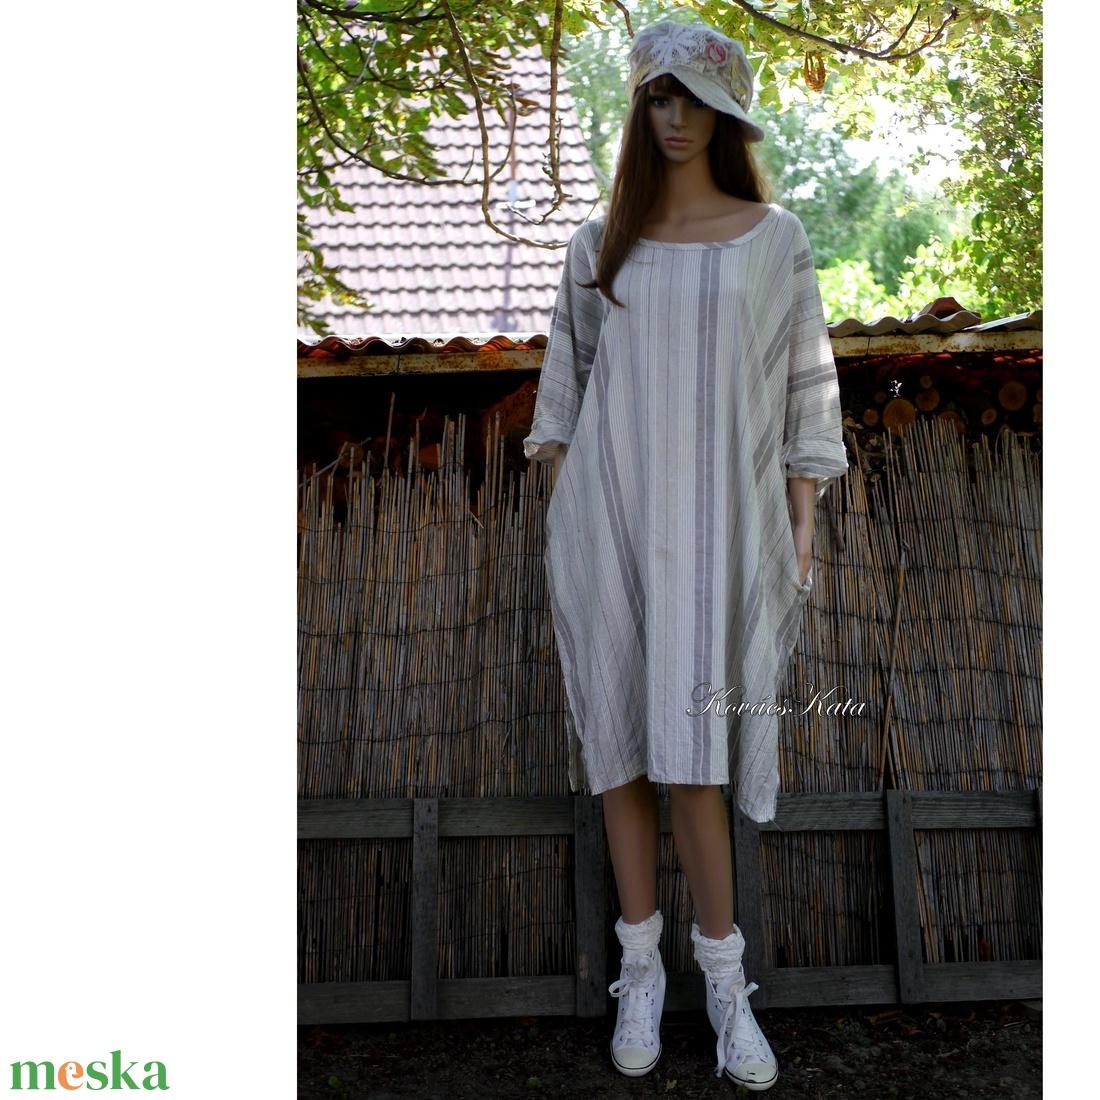 DETTI - lenvászon tunikaruha, csíkos ingruha - ruha & divat - női ruha - ruha - Meska.hu